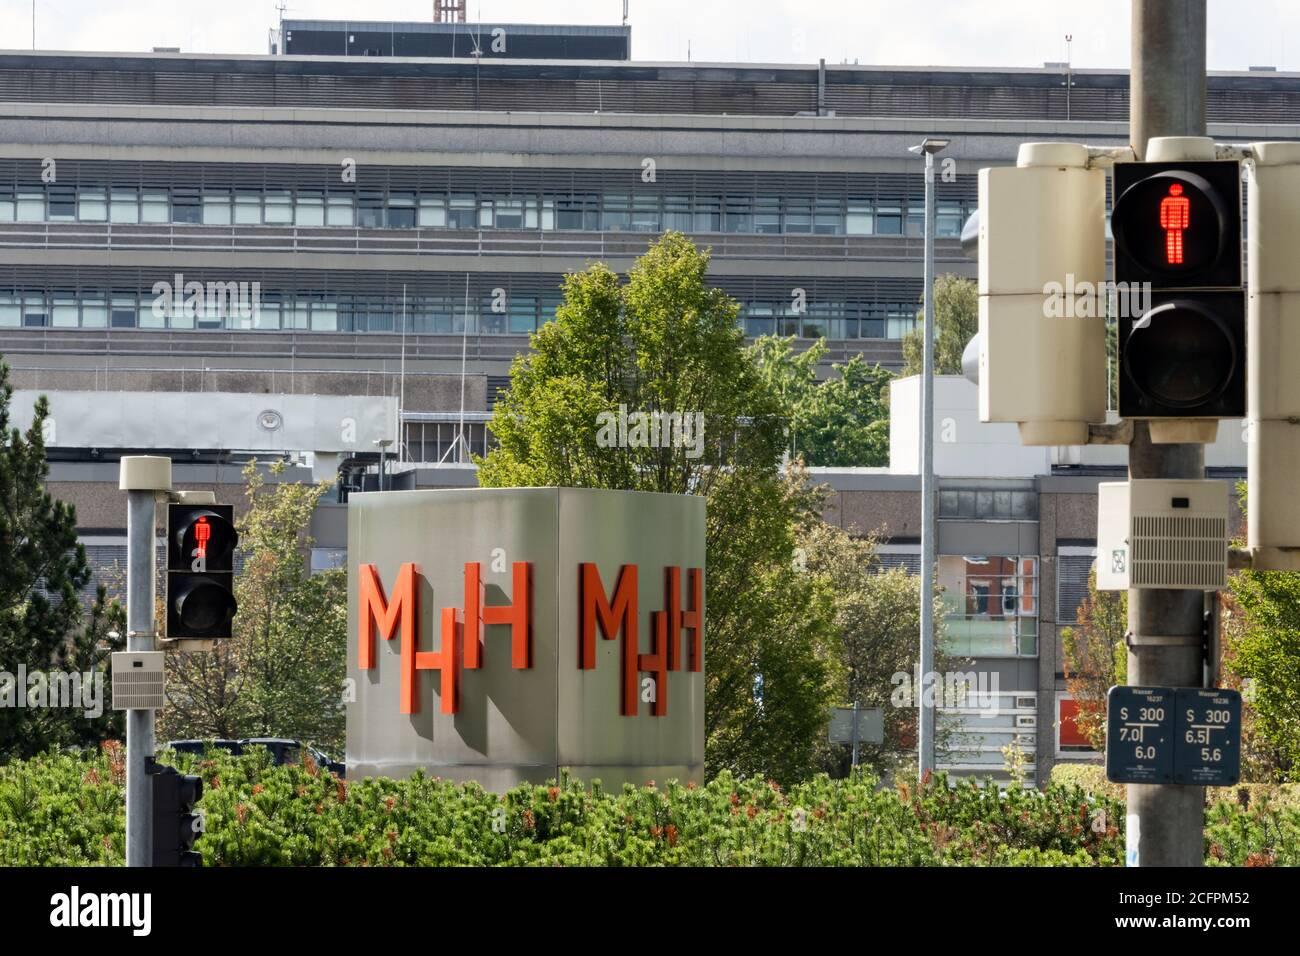 Hanover, Germany, 09/06/2020: MHH Hannover Medical School, sign with the logo of the MHH.   ---   Hannover, 06.09.2020: MHH Medizinische Hochschule Hannover, Schild mit dem Logo der MHH. Stock Photo